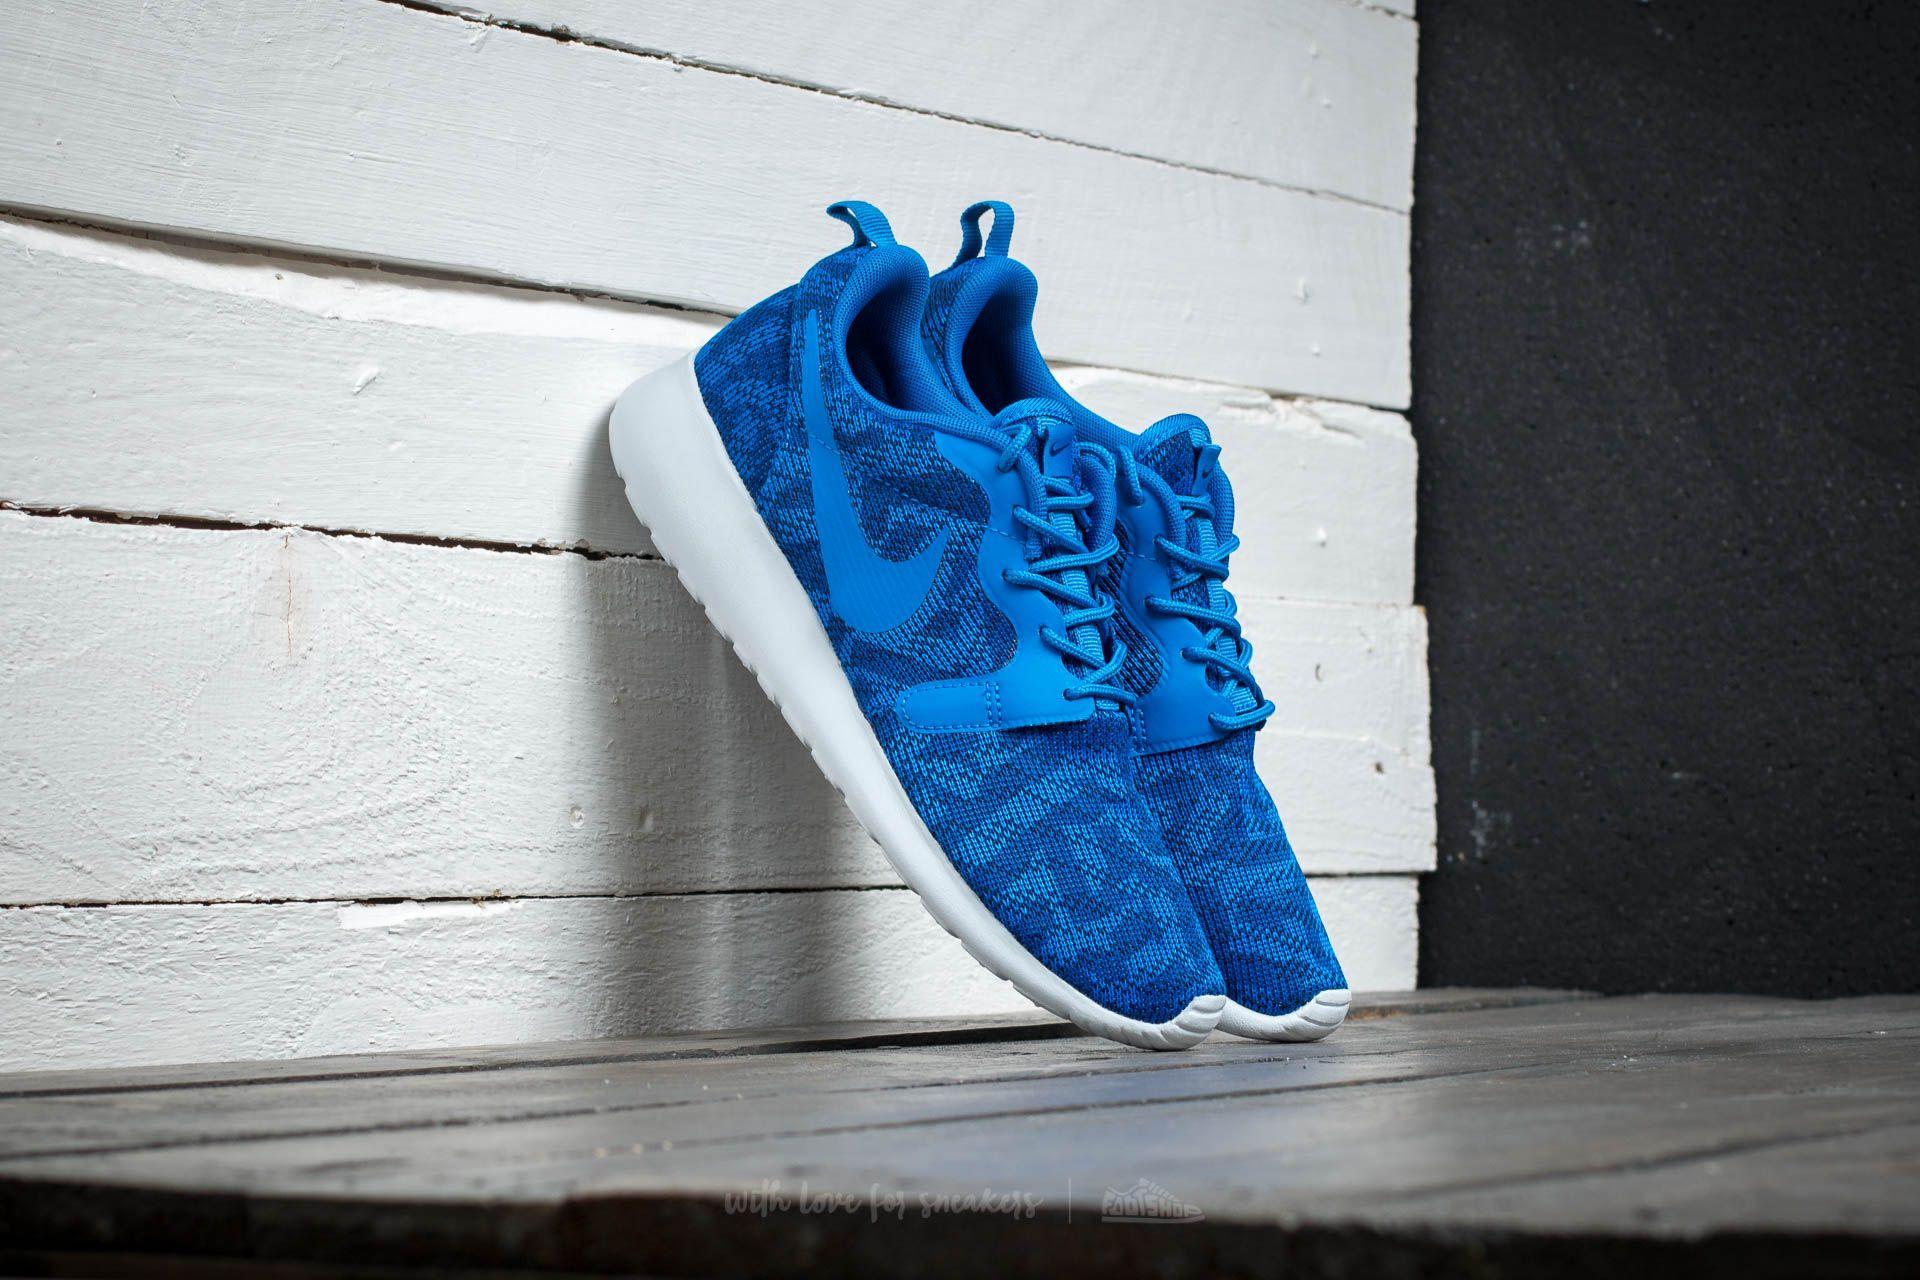 Superioridad Lirio riqueza  Women's shoes Nike Wmns Roshe One KJCRD Deep Royal Blue/ Soar- Platinum